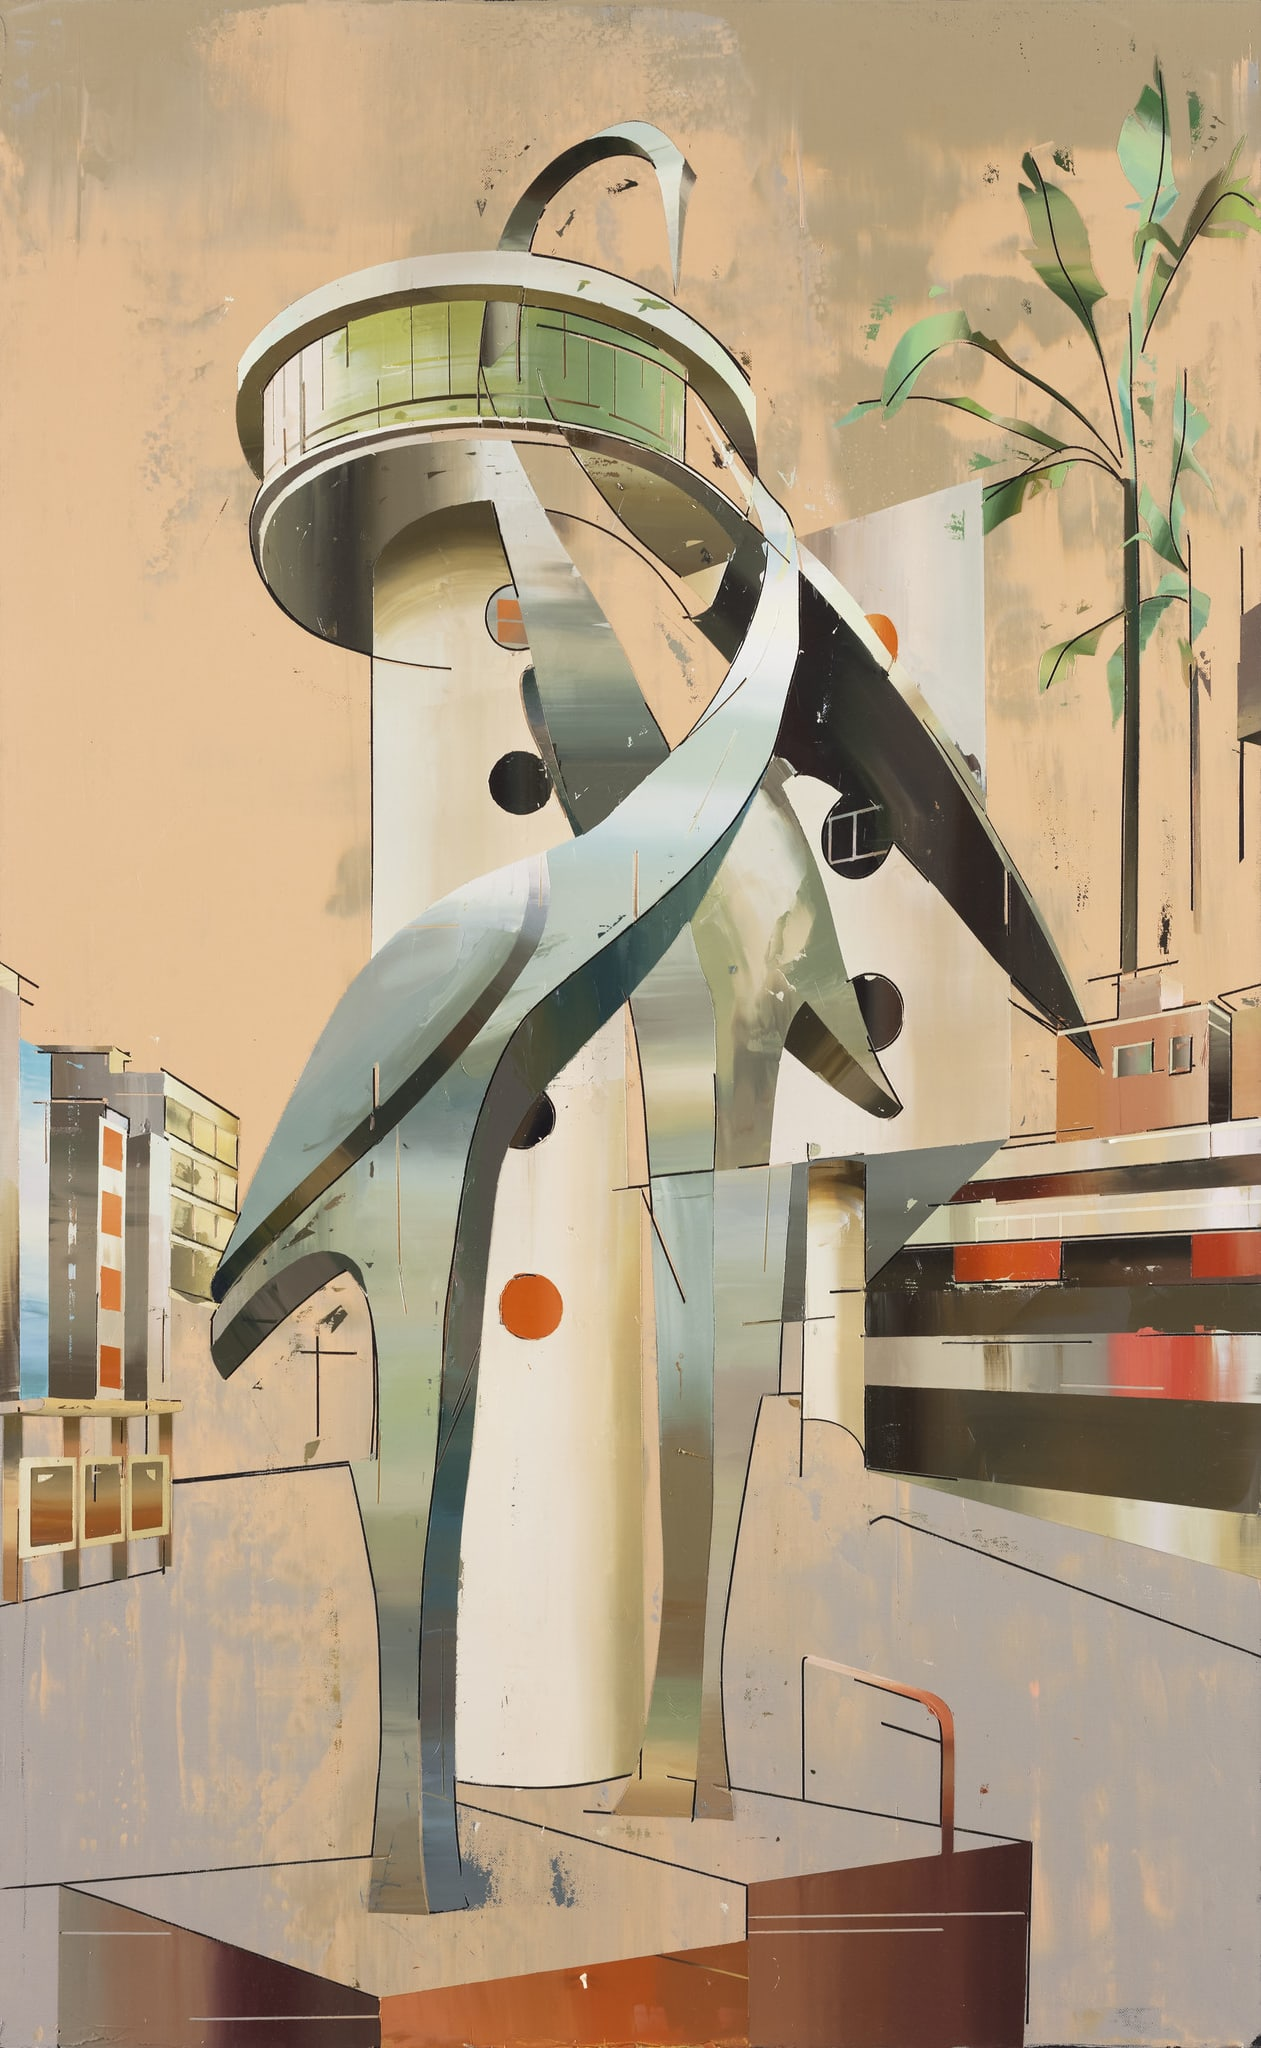 Building of Cranes #2 by Cui Jie